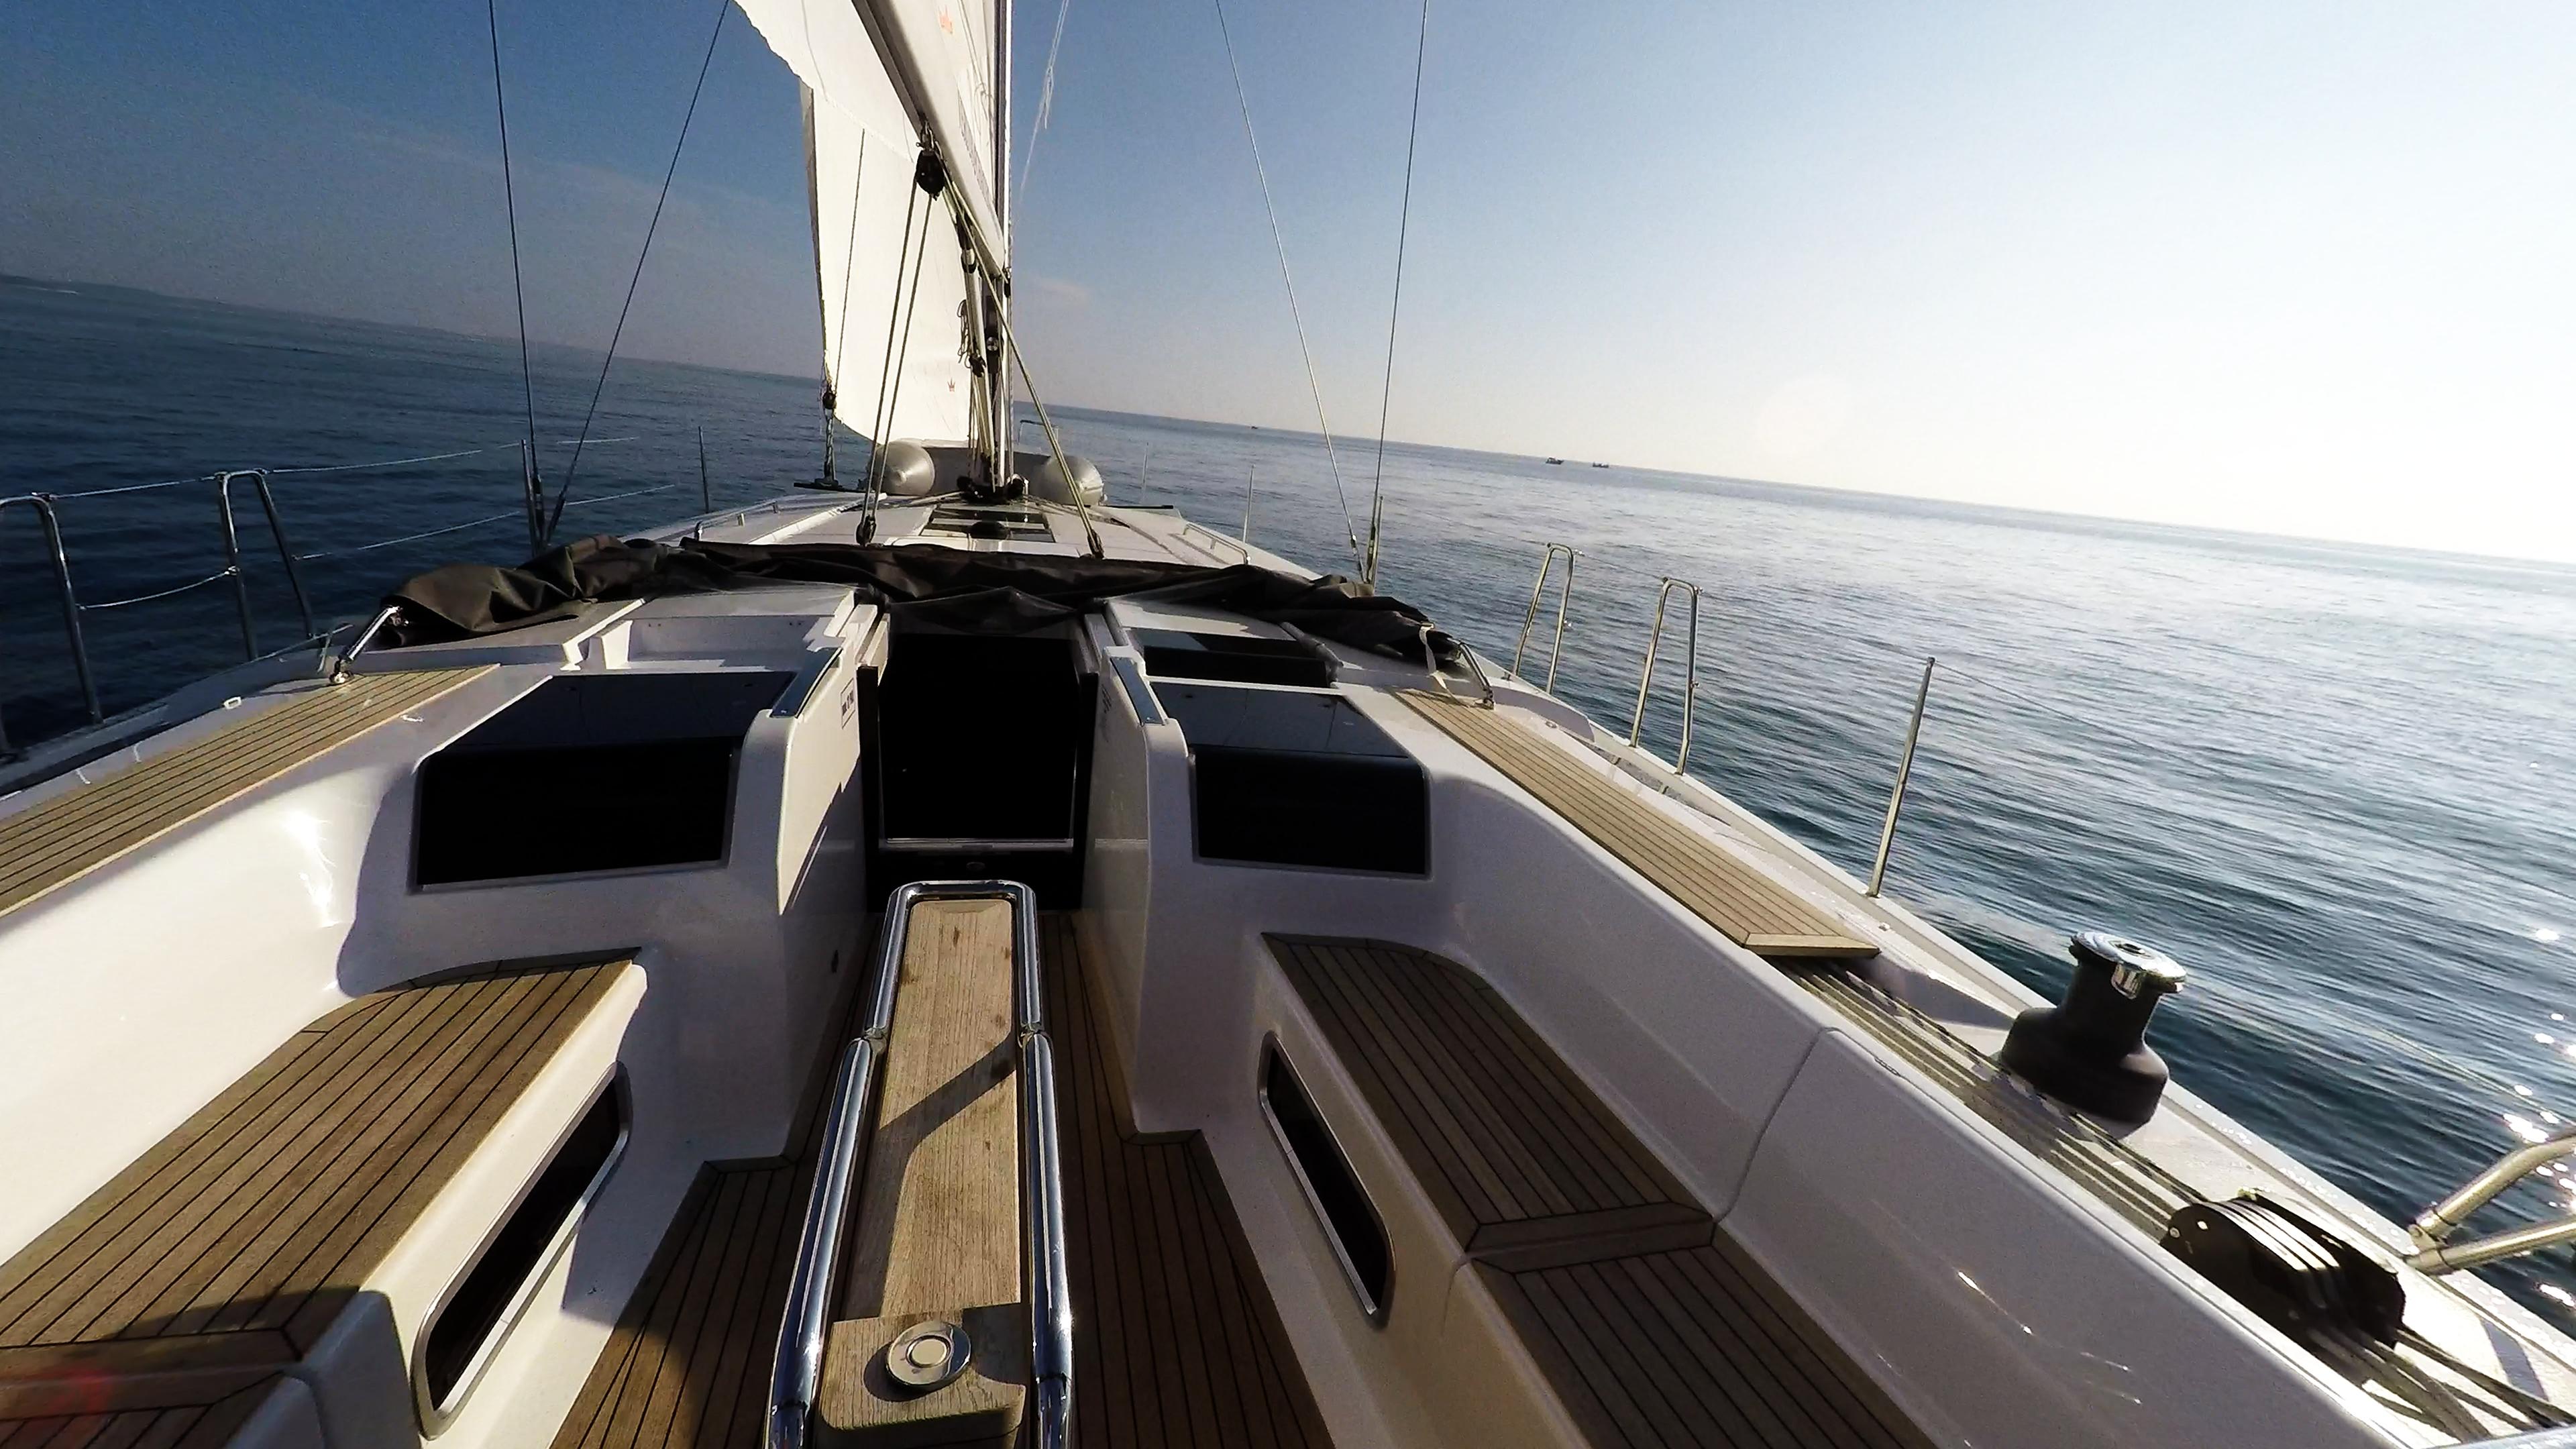 barcha a vela teak pozzetto tavolo yacht a vela Hanse 505 barca